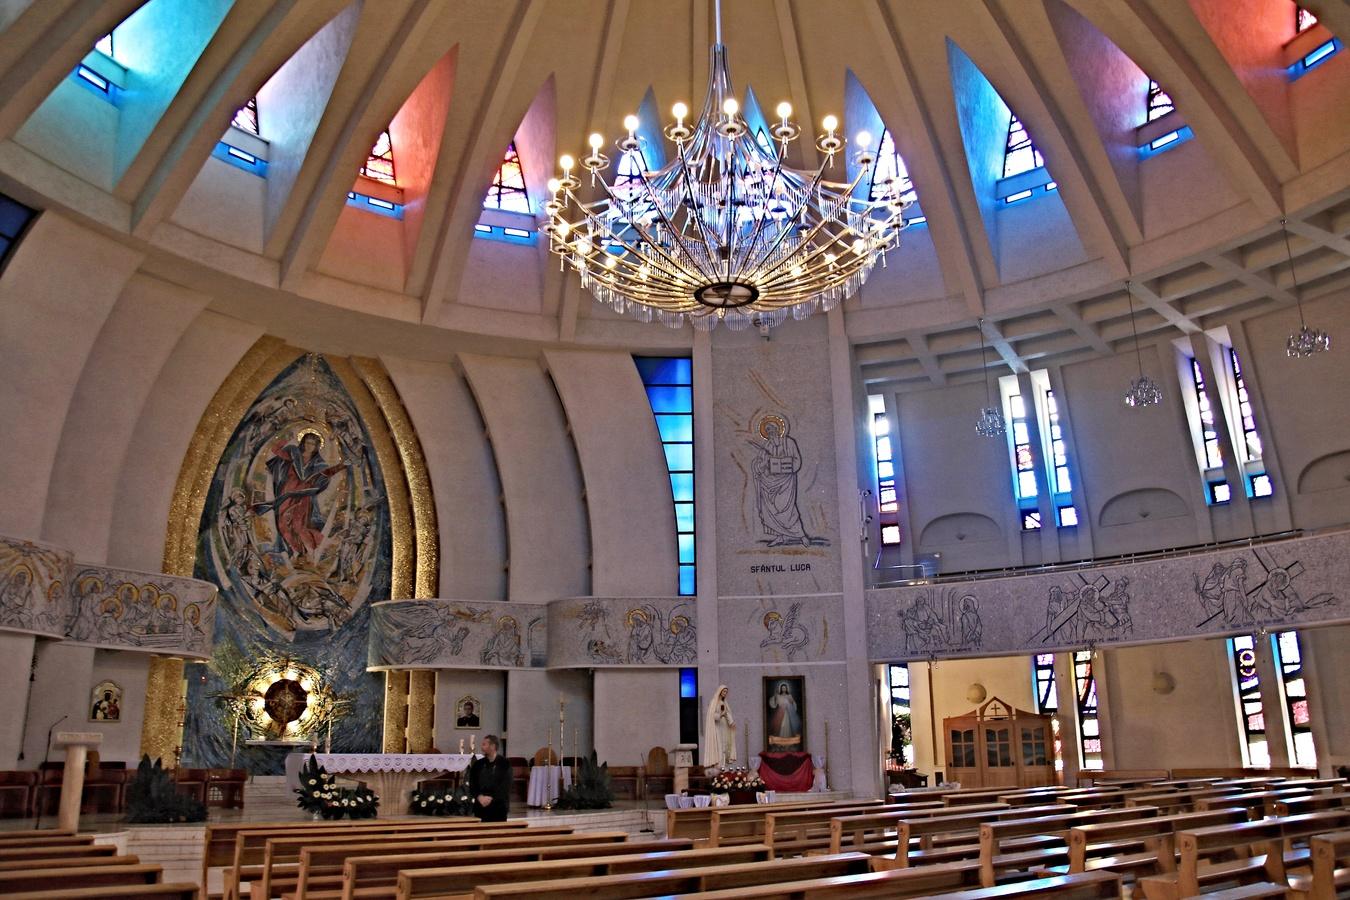 Rumunsko - katedrála Panny Marie